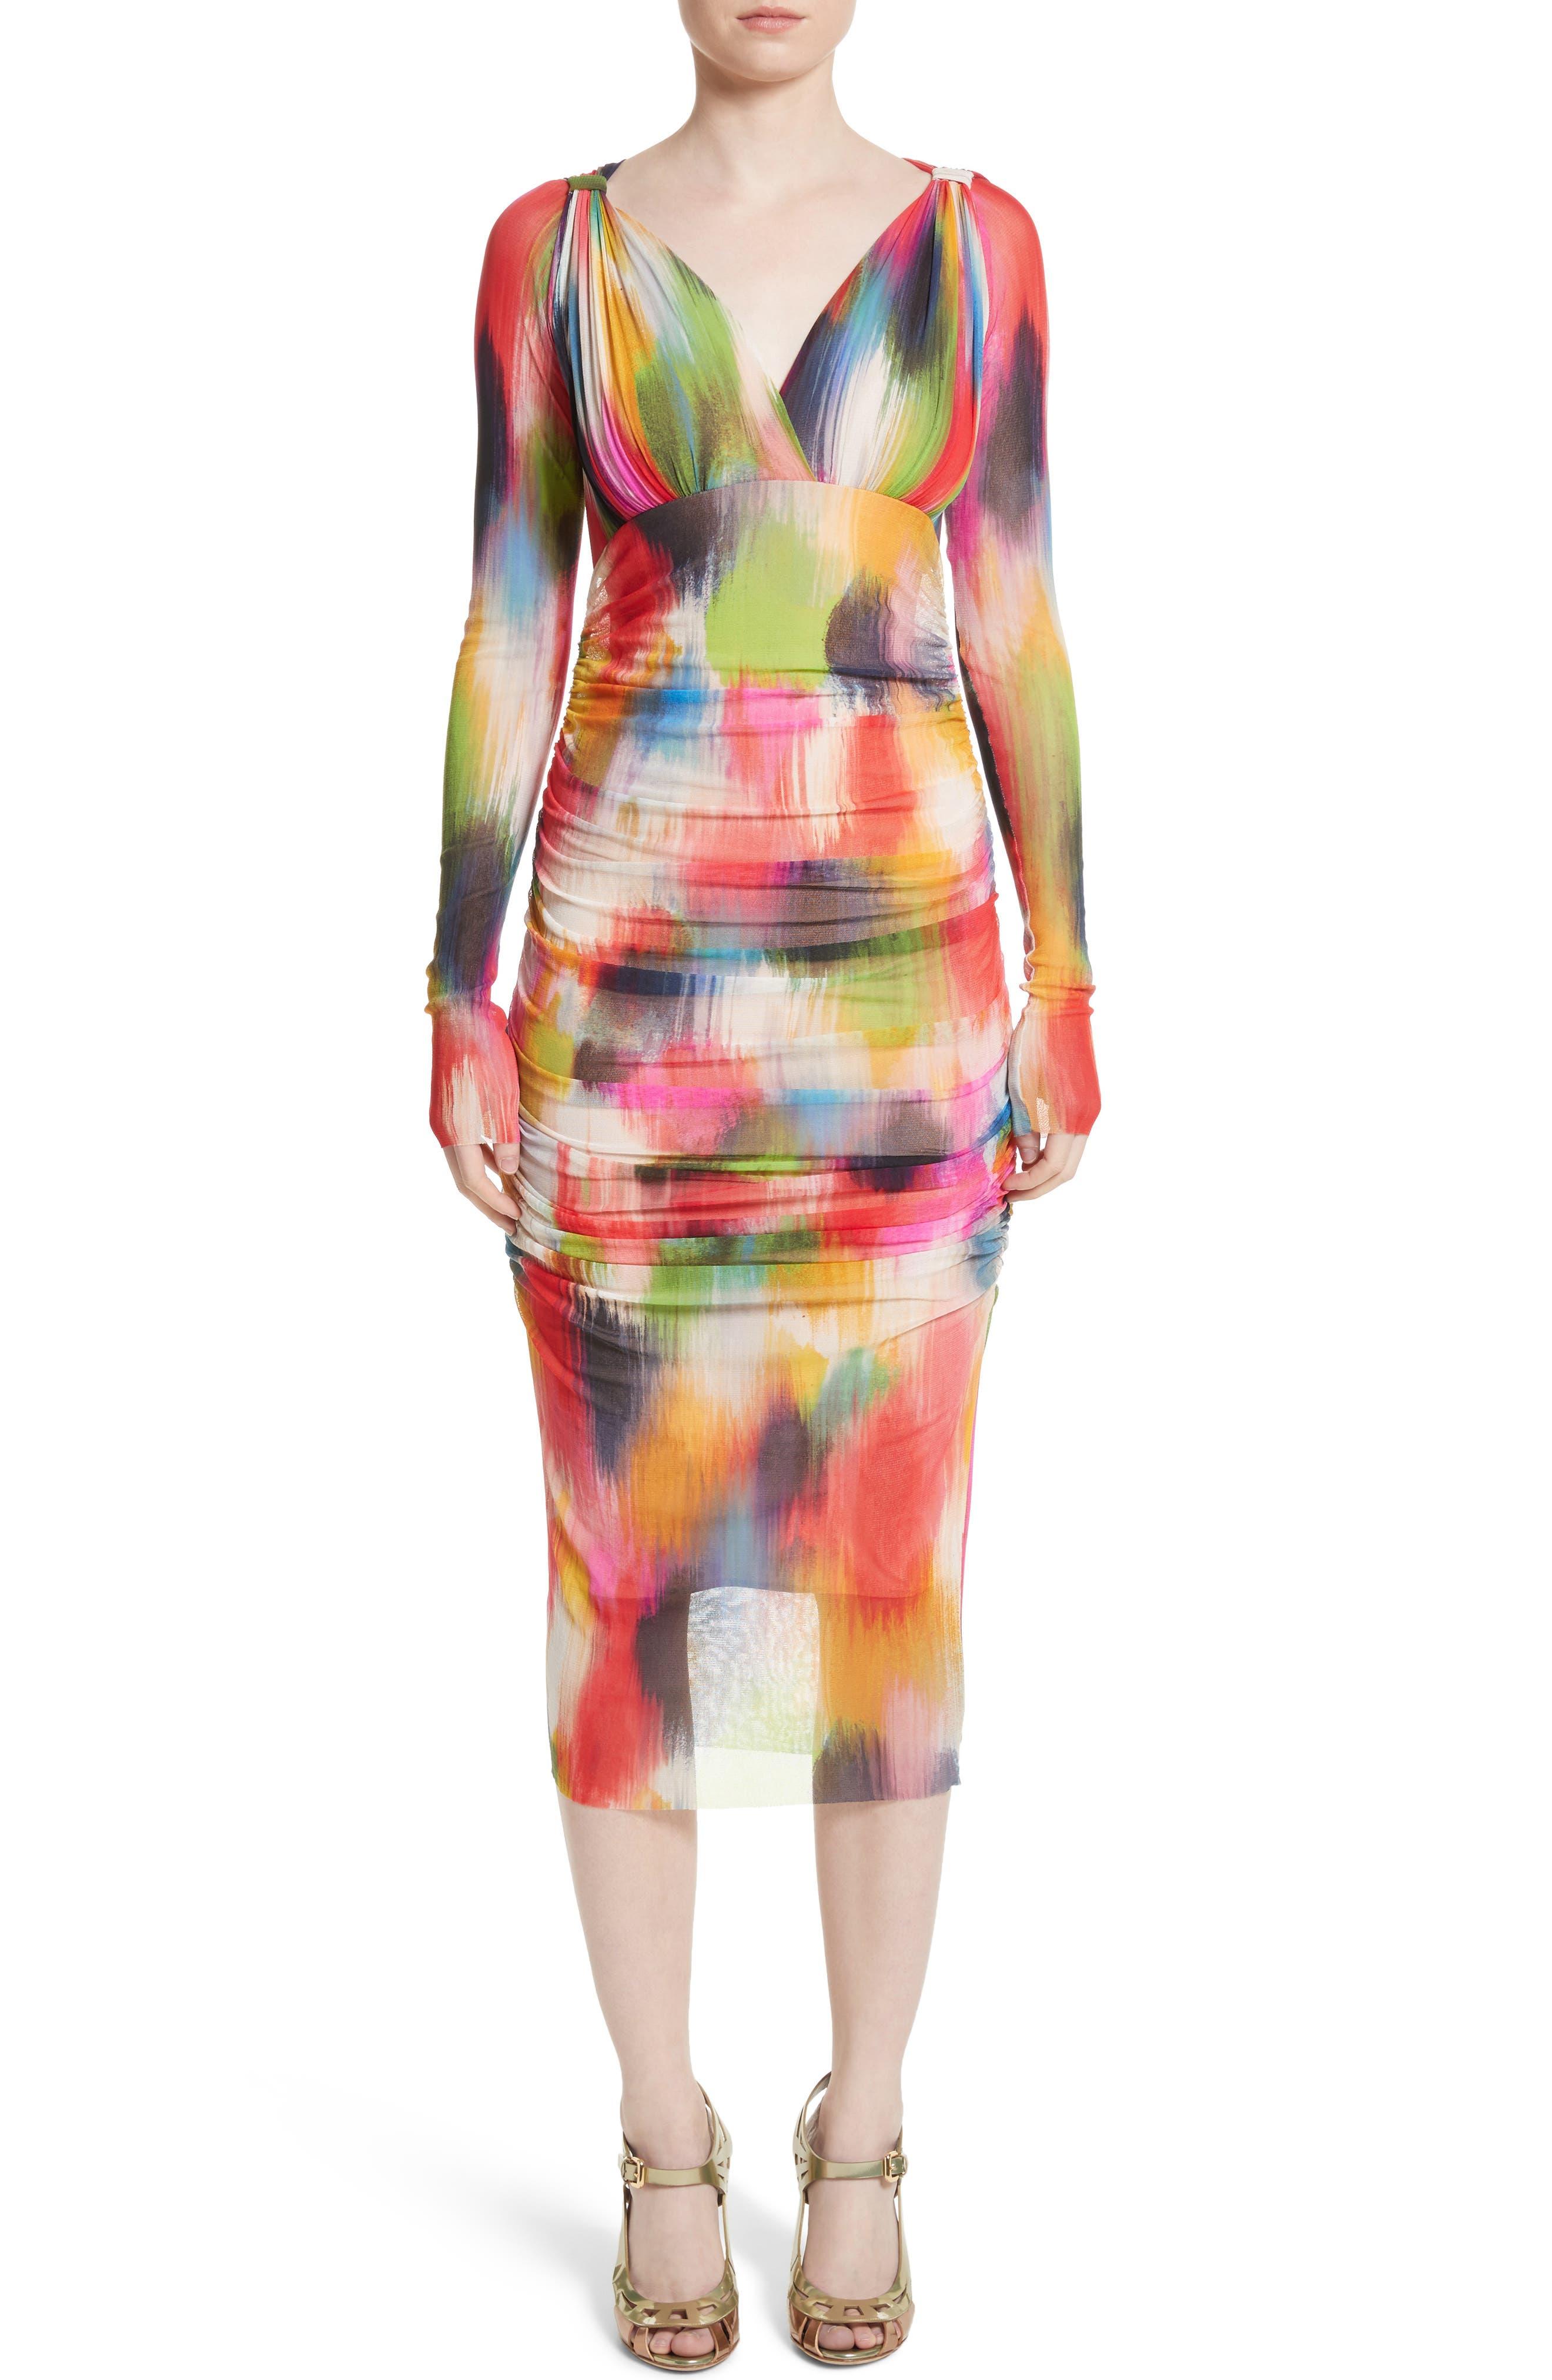 Alternate Image 1 Selected - Fuzzi Brushstroke Print Tulle Ruched Dress